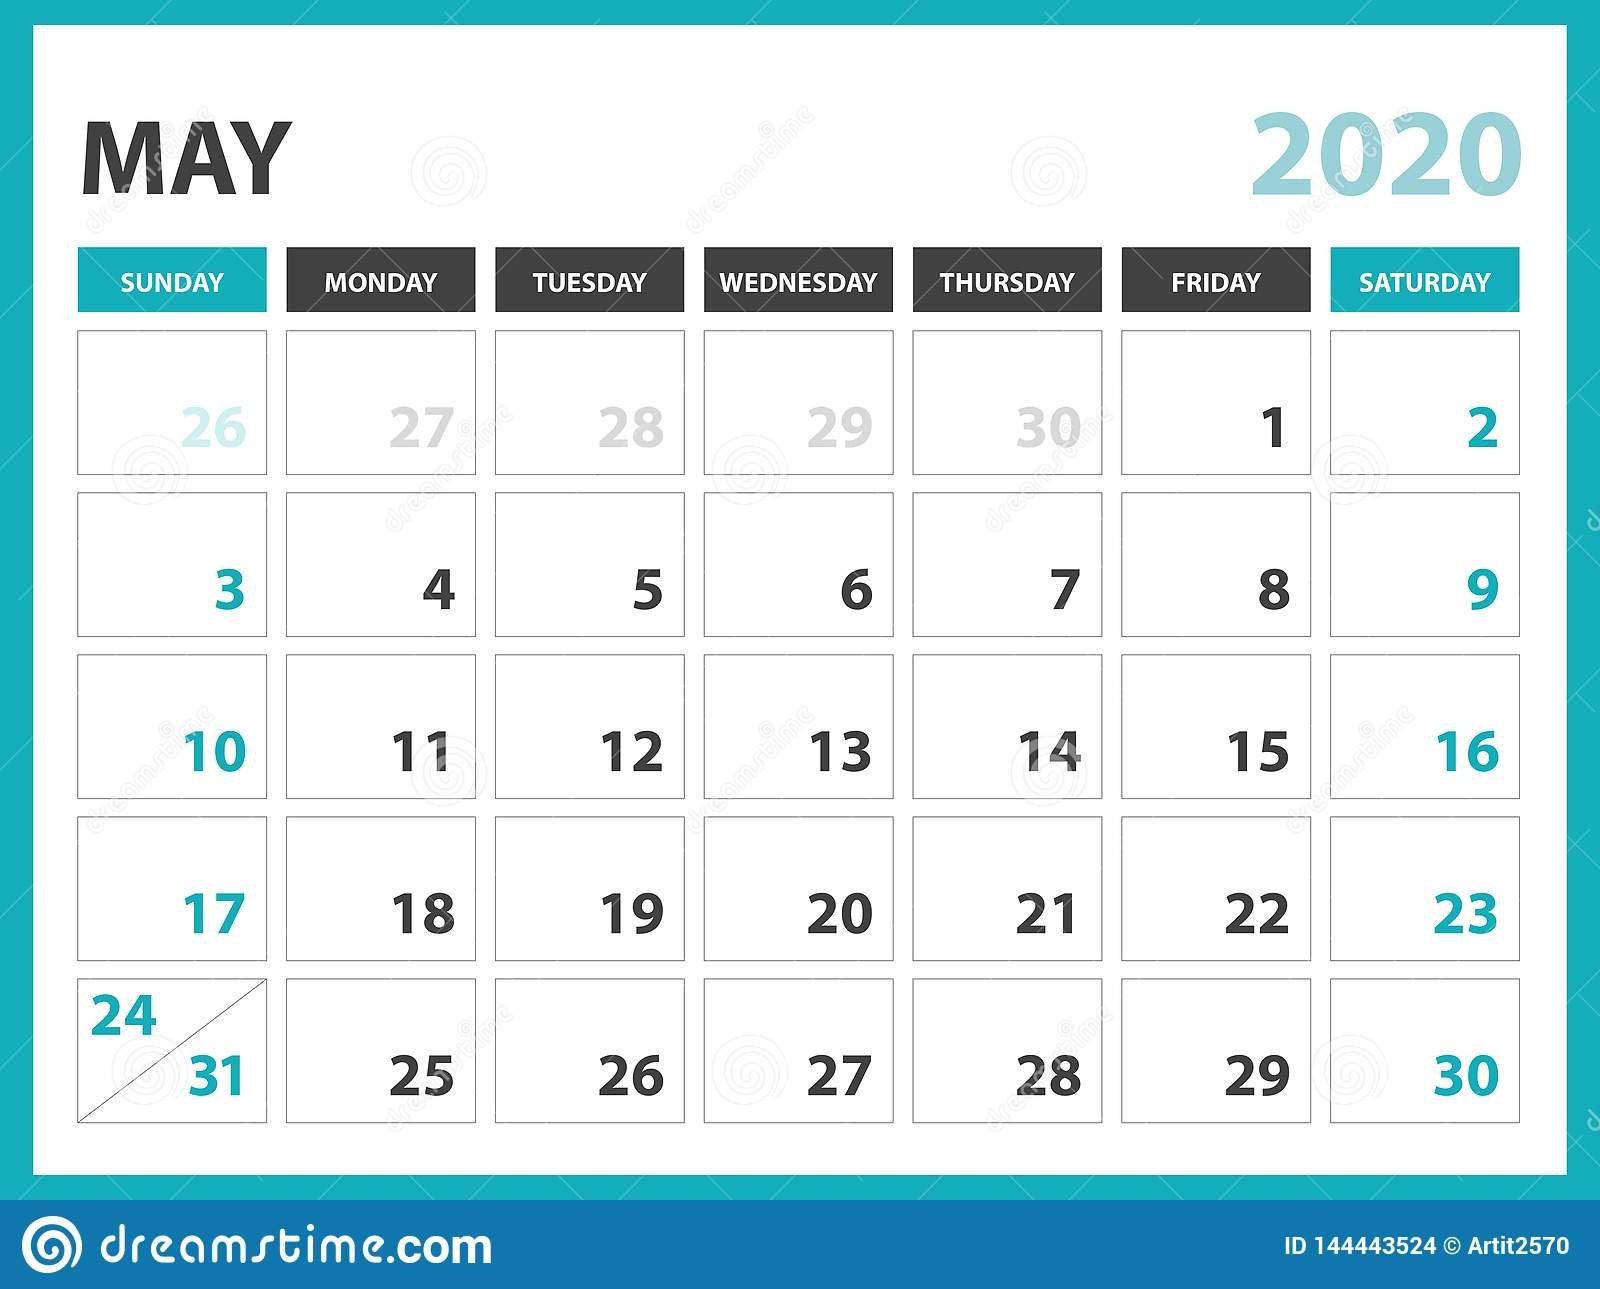 Desk Calendar Layout Size 8 X 6 Inch, May 2020 Calendar 8 By 11 Size Calendar Template